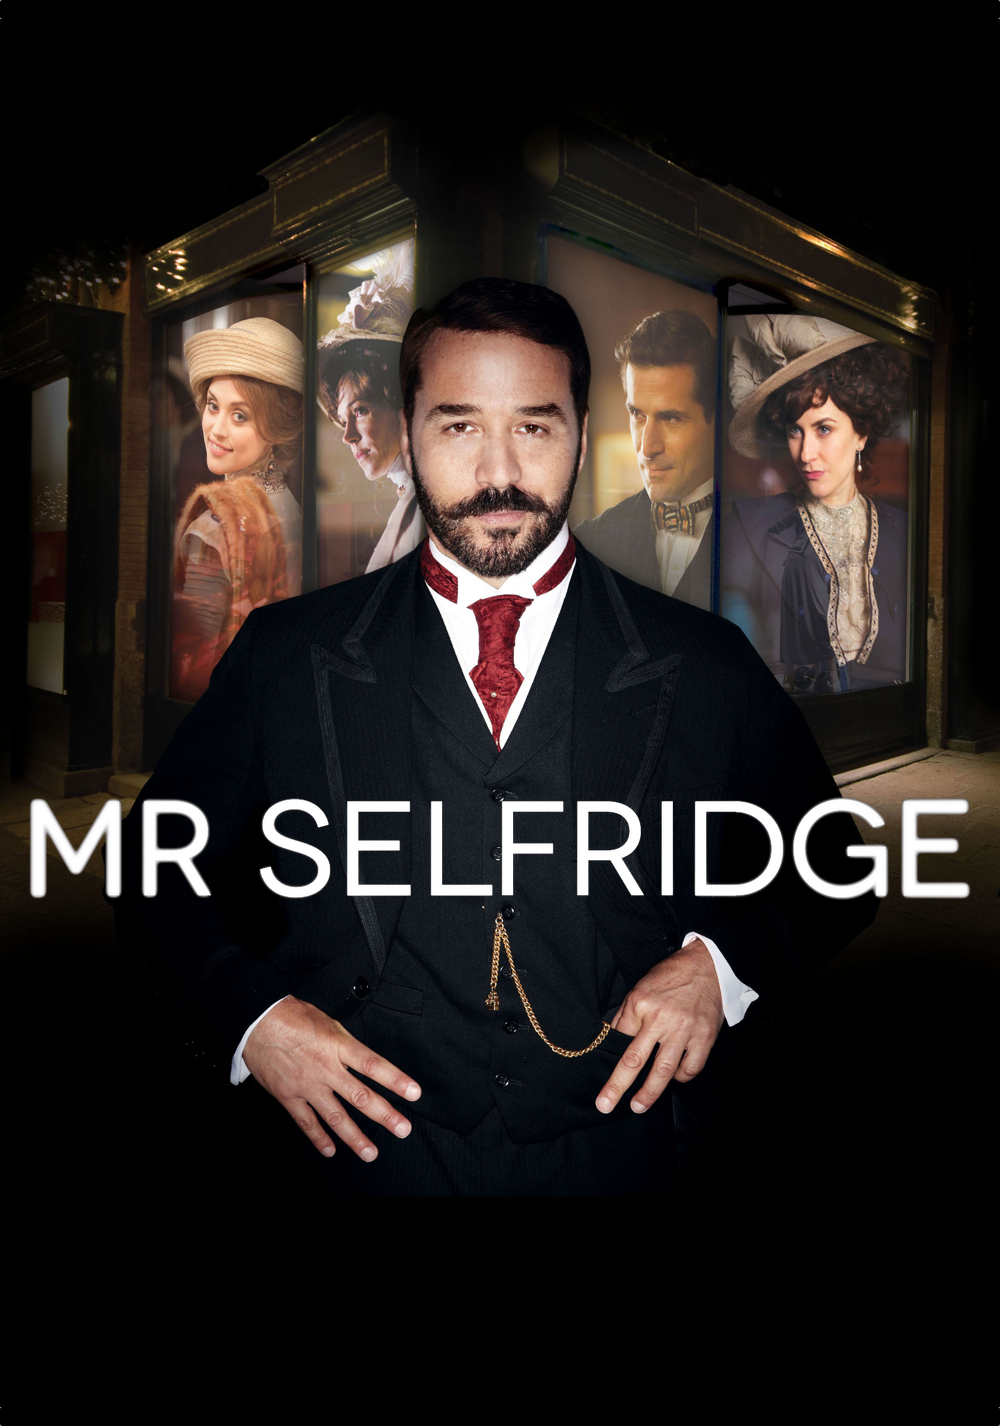 Mr Selfridge Seasons 1-4